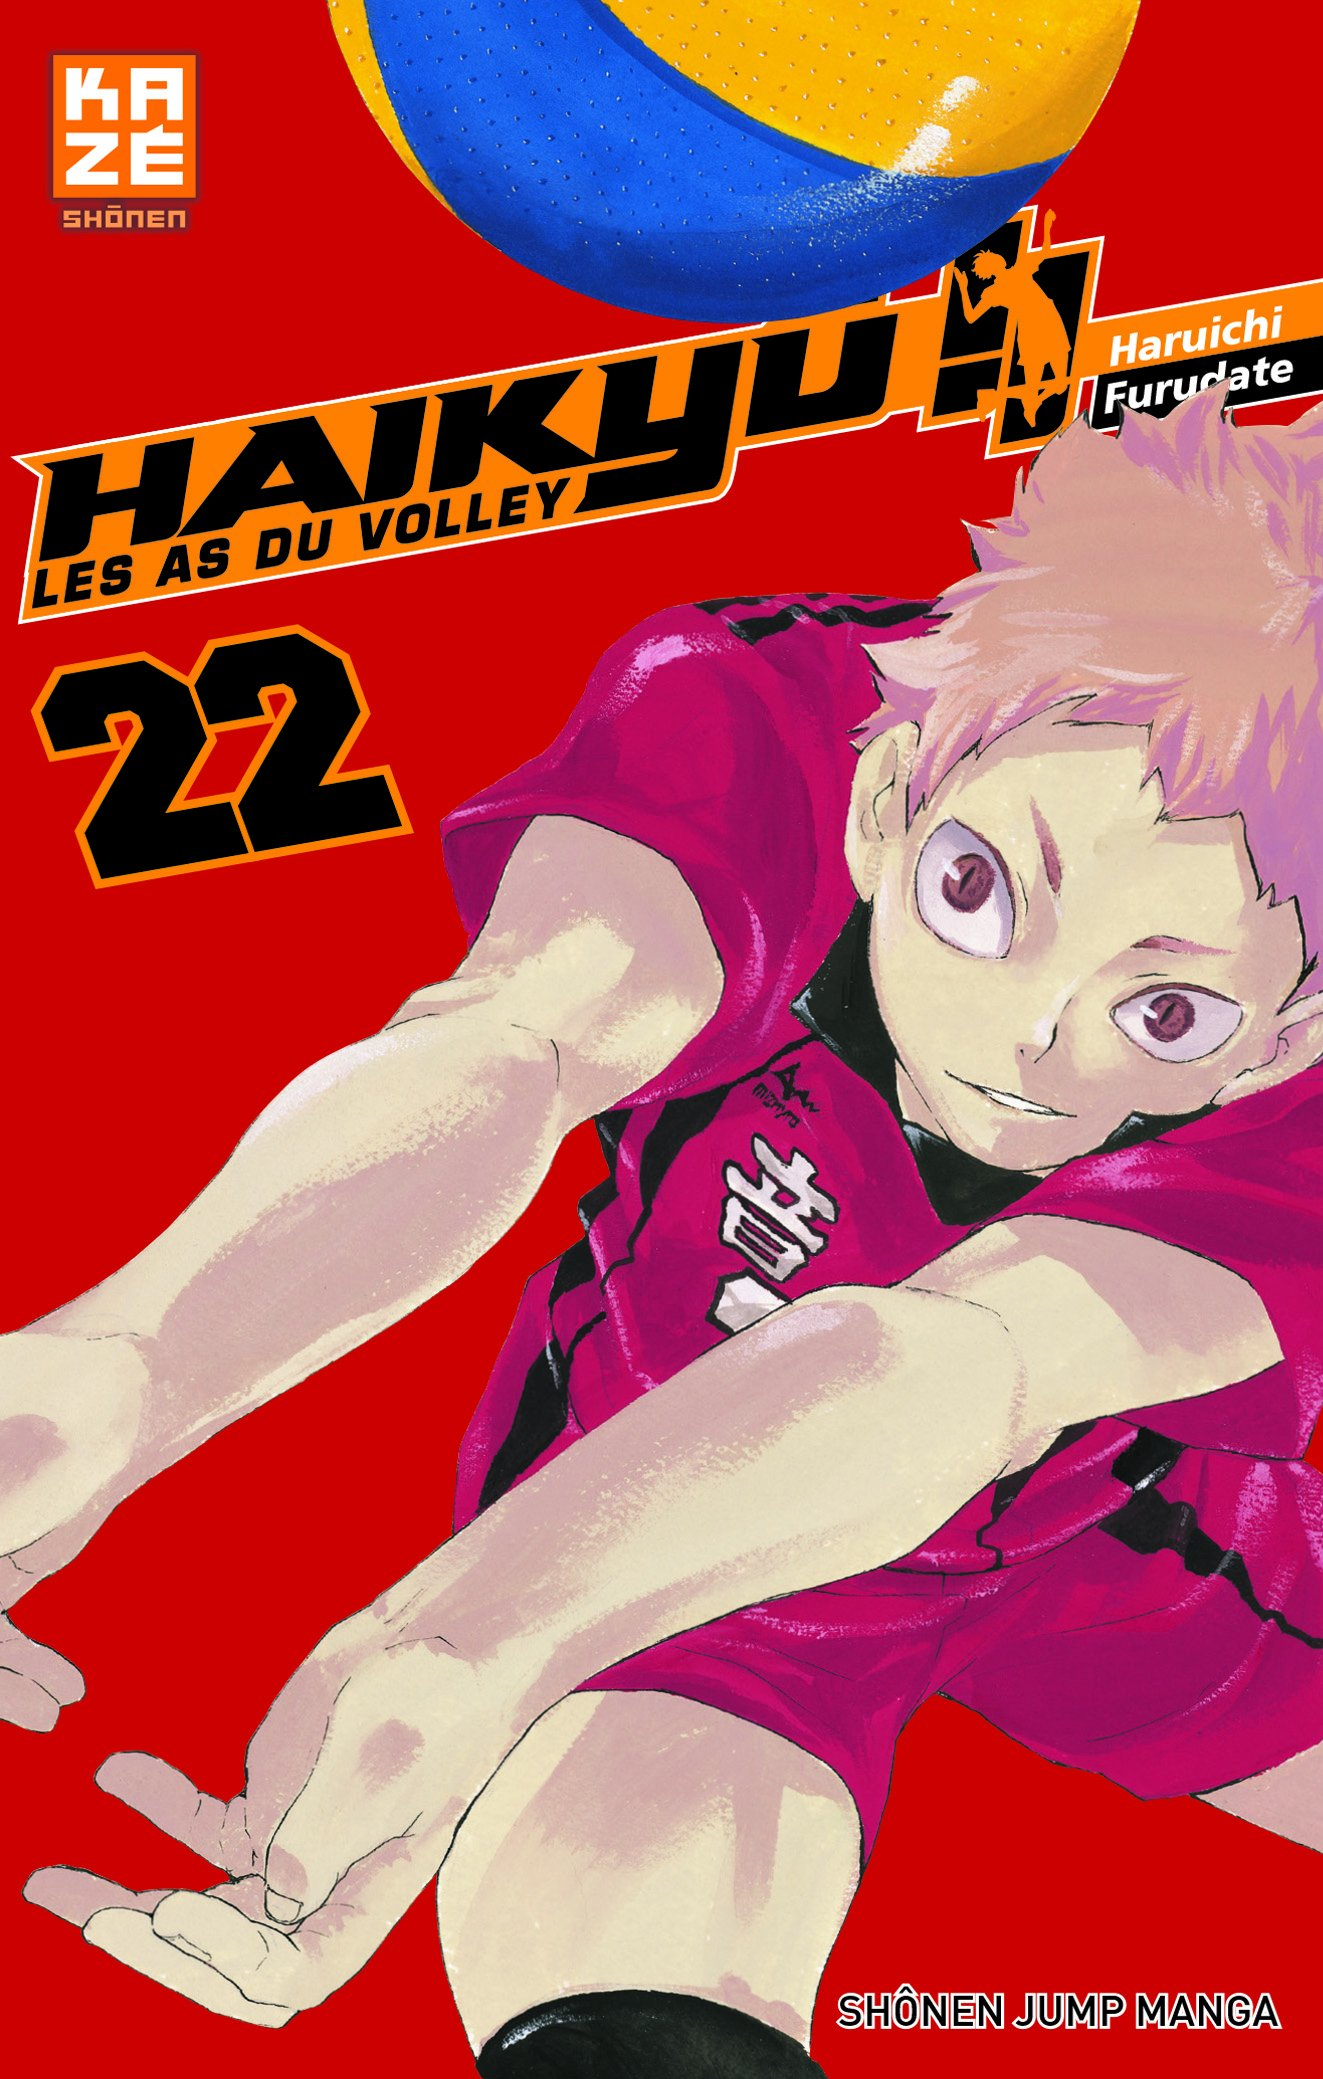 Haikyu !! Les As du Volley 22